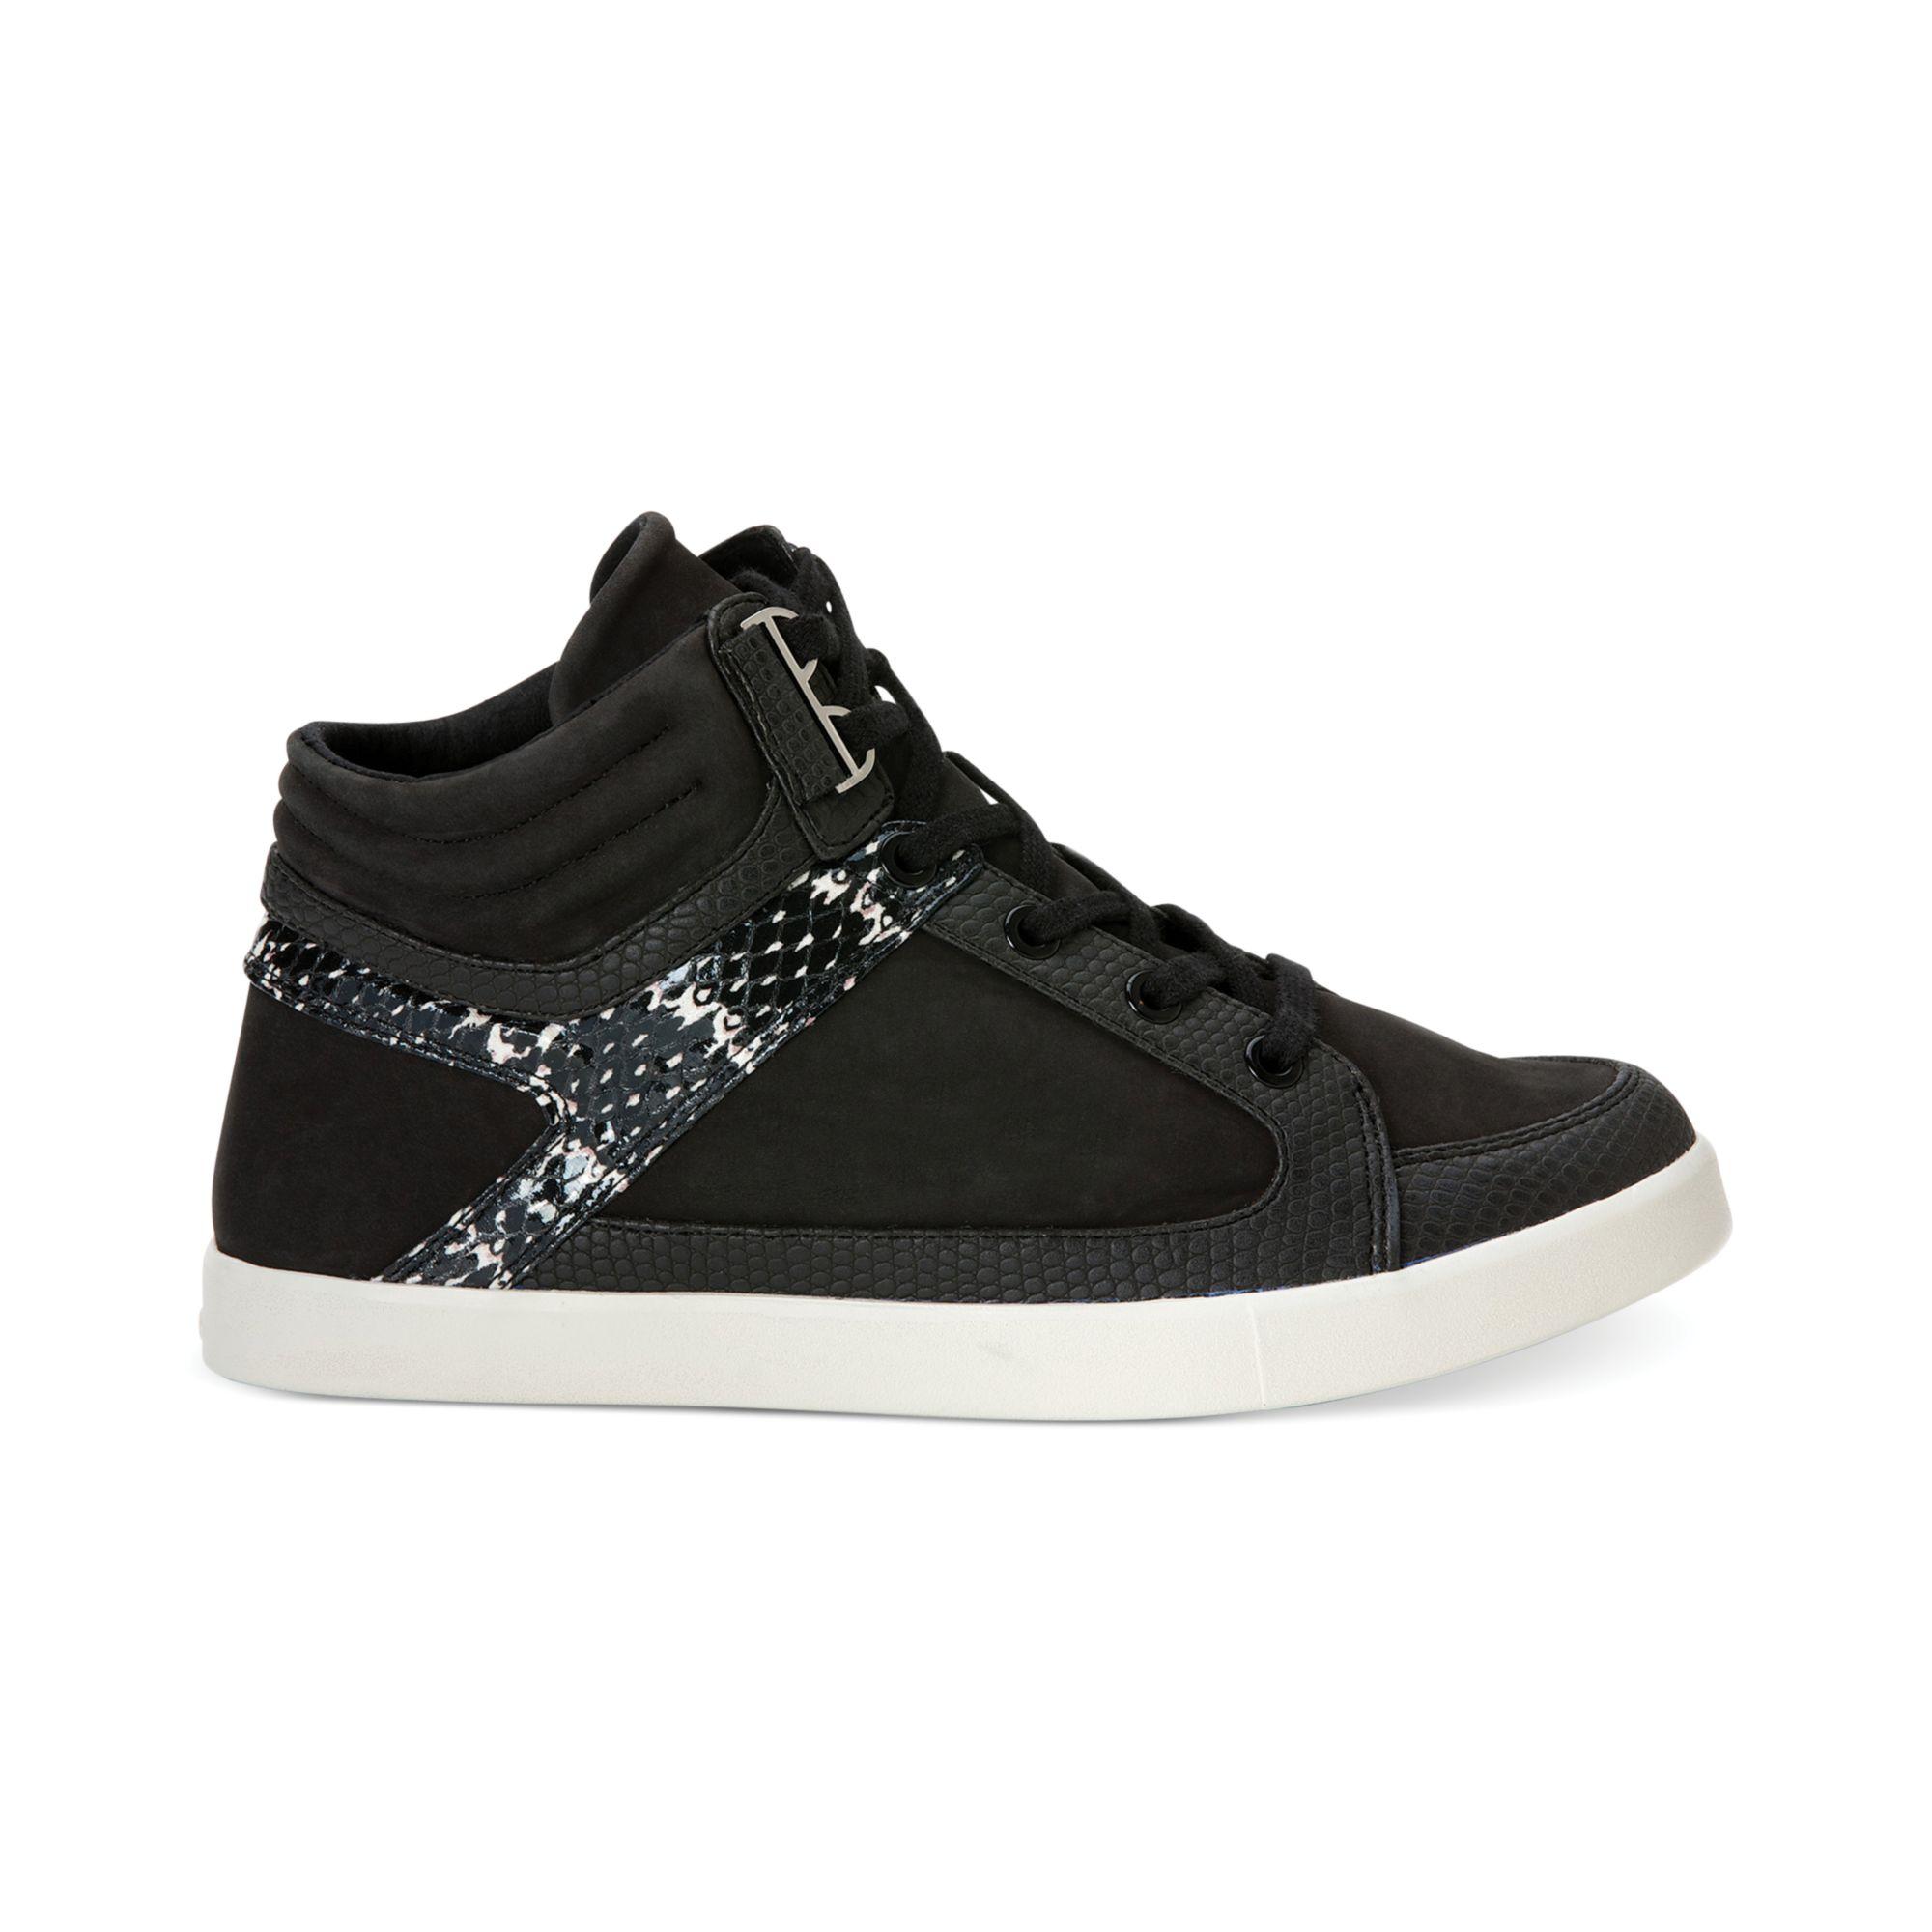 calvin klein women 39 s lyda high top sneakers in black lyst. Black Bedroom Furniture Sets. Home Design Ideas